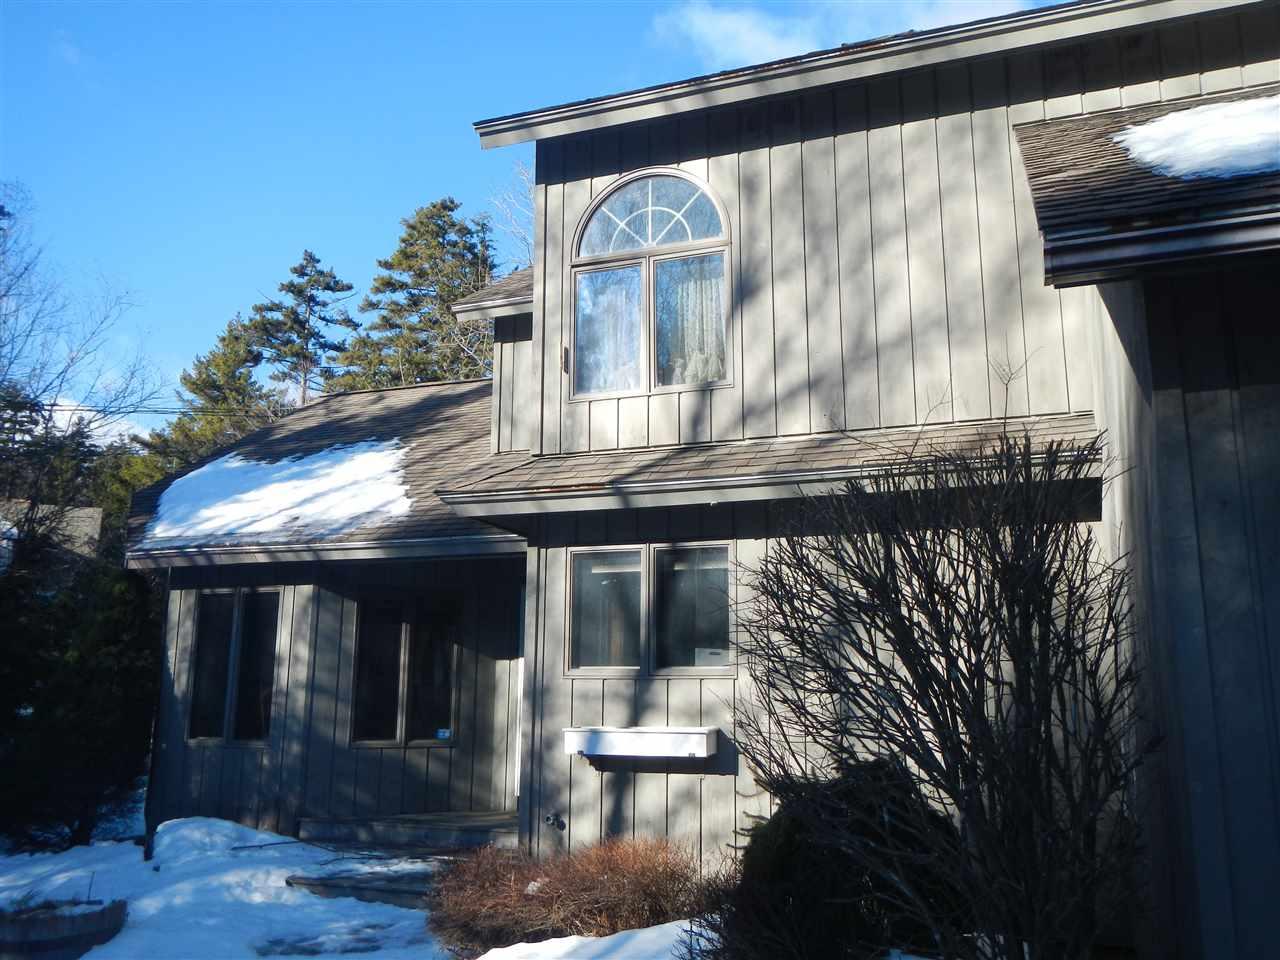 Mount-Snow-Real-Estate-4614310-22